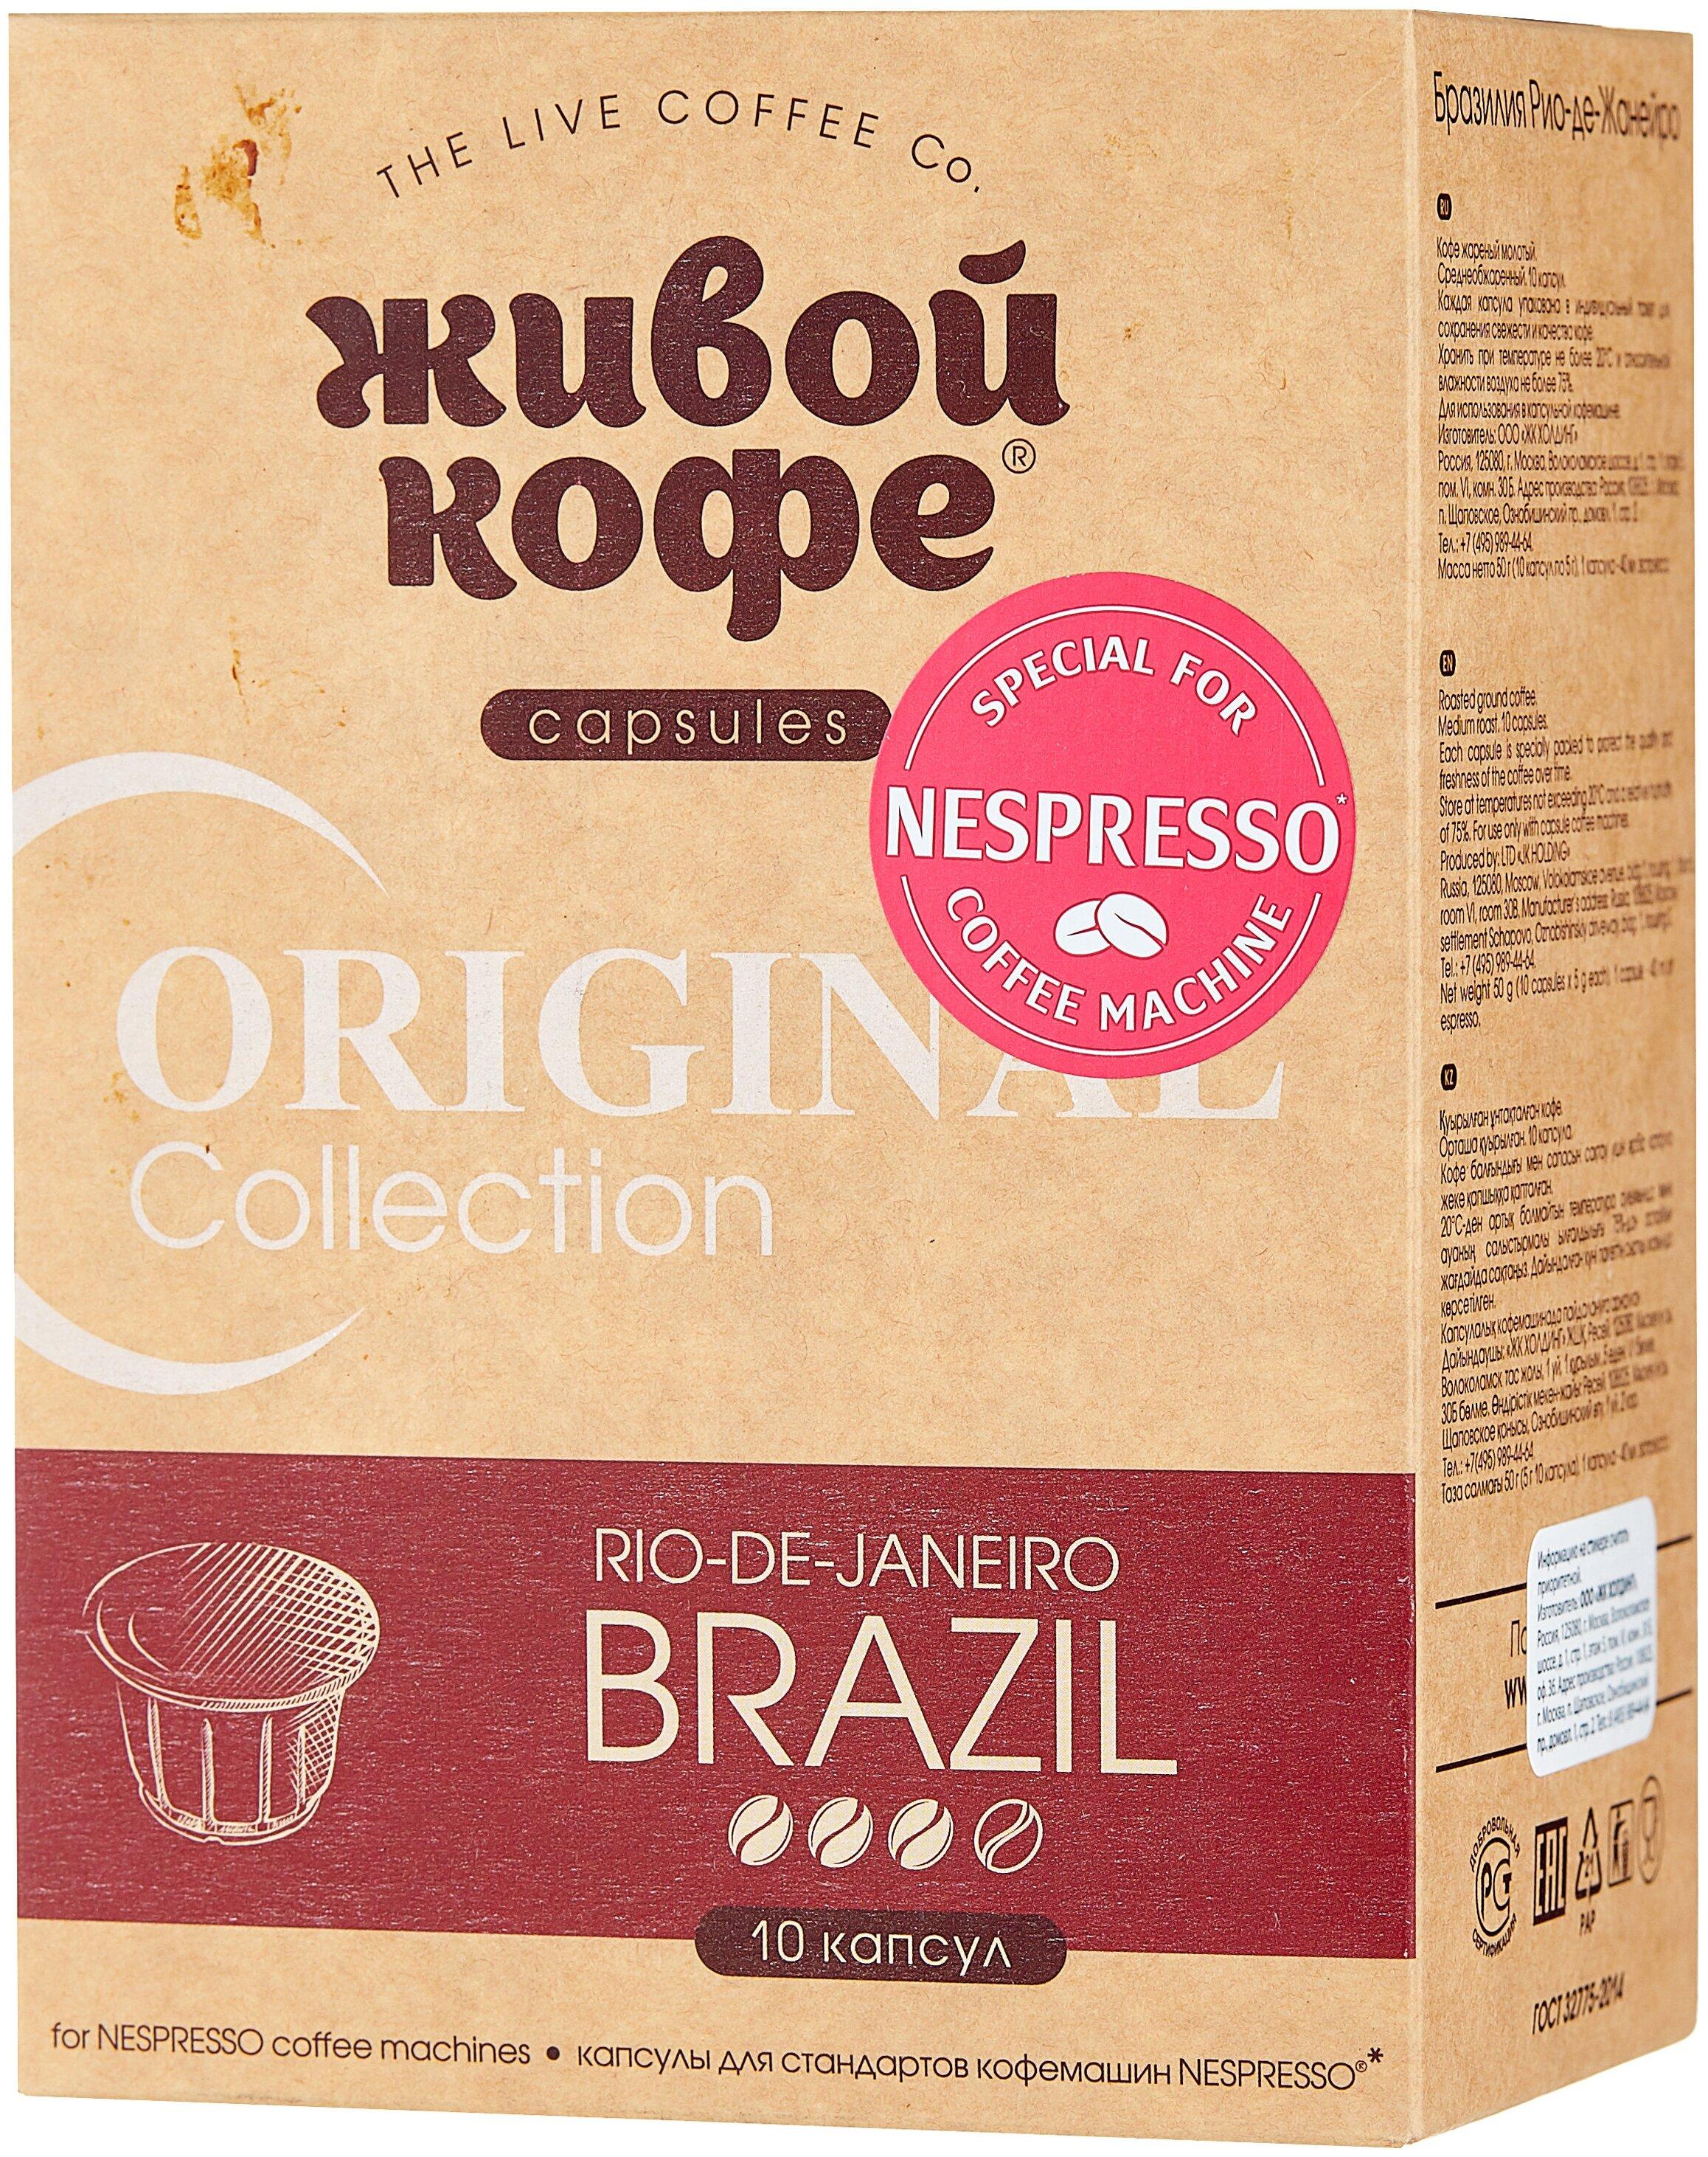 сафари кофе живой кофе кофемашина